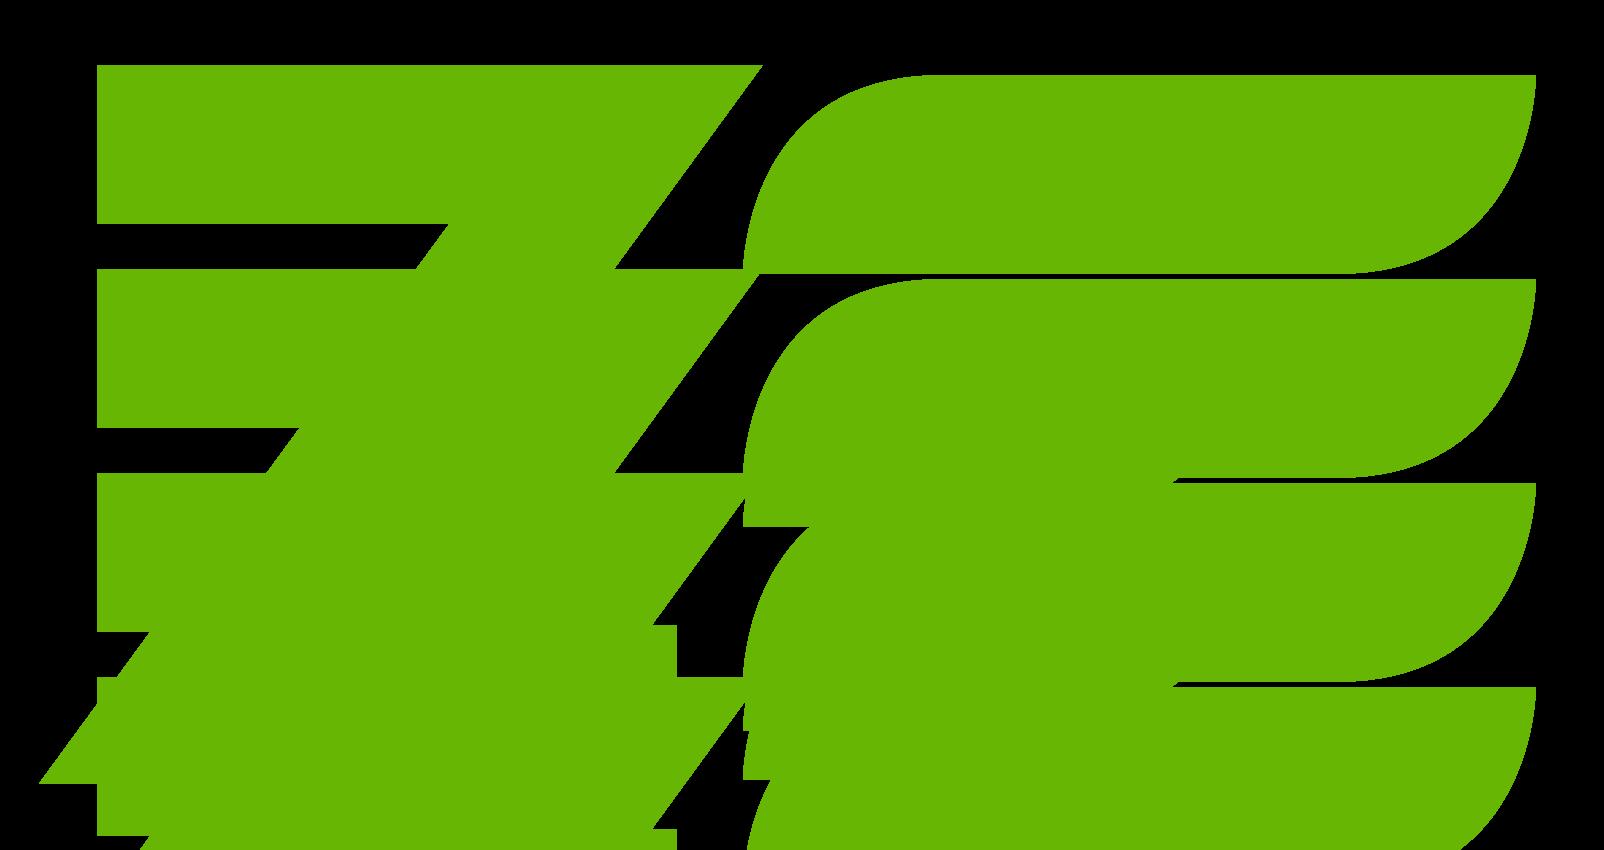 Zend Framework 1 & 2